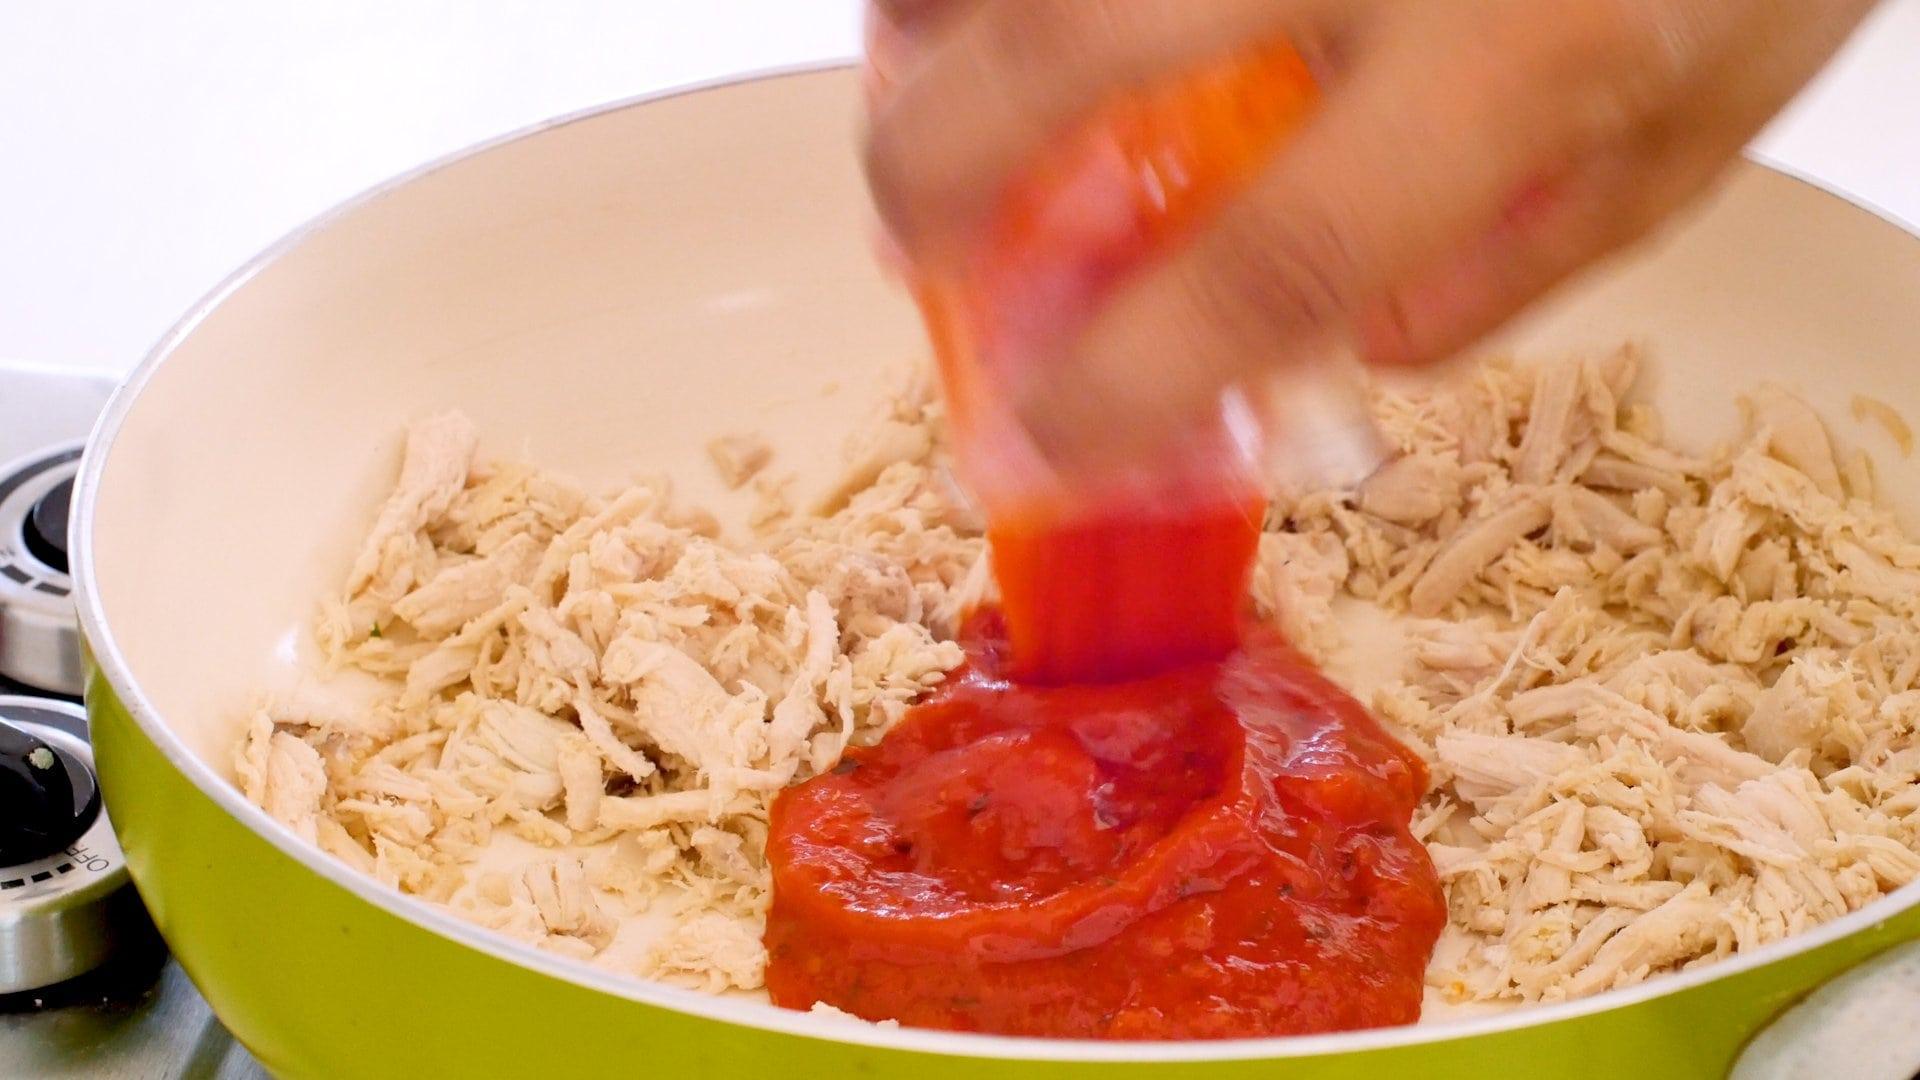 Agregando salsa de tomate al pollo